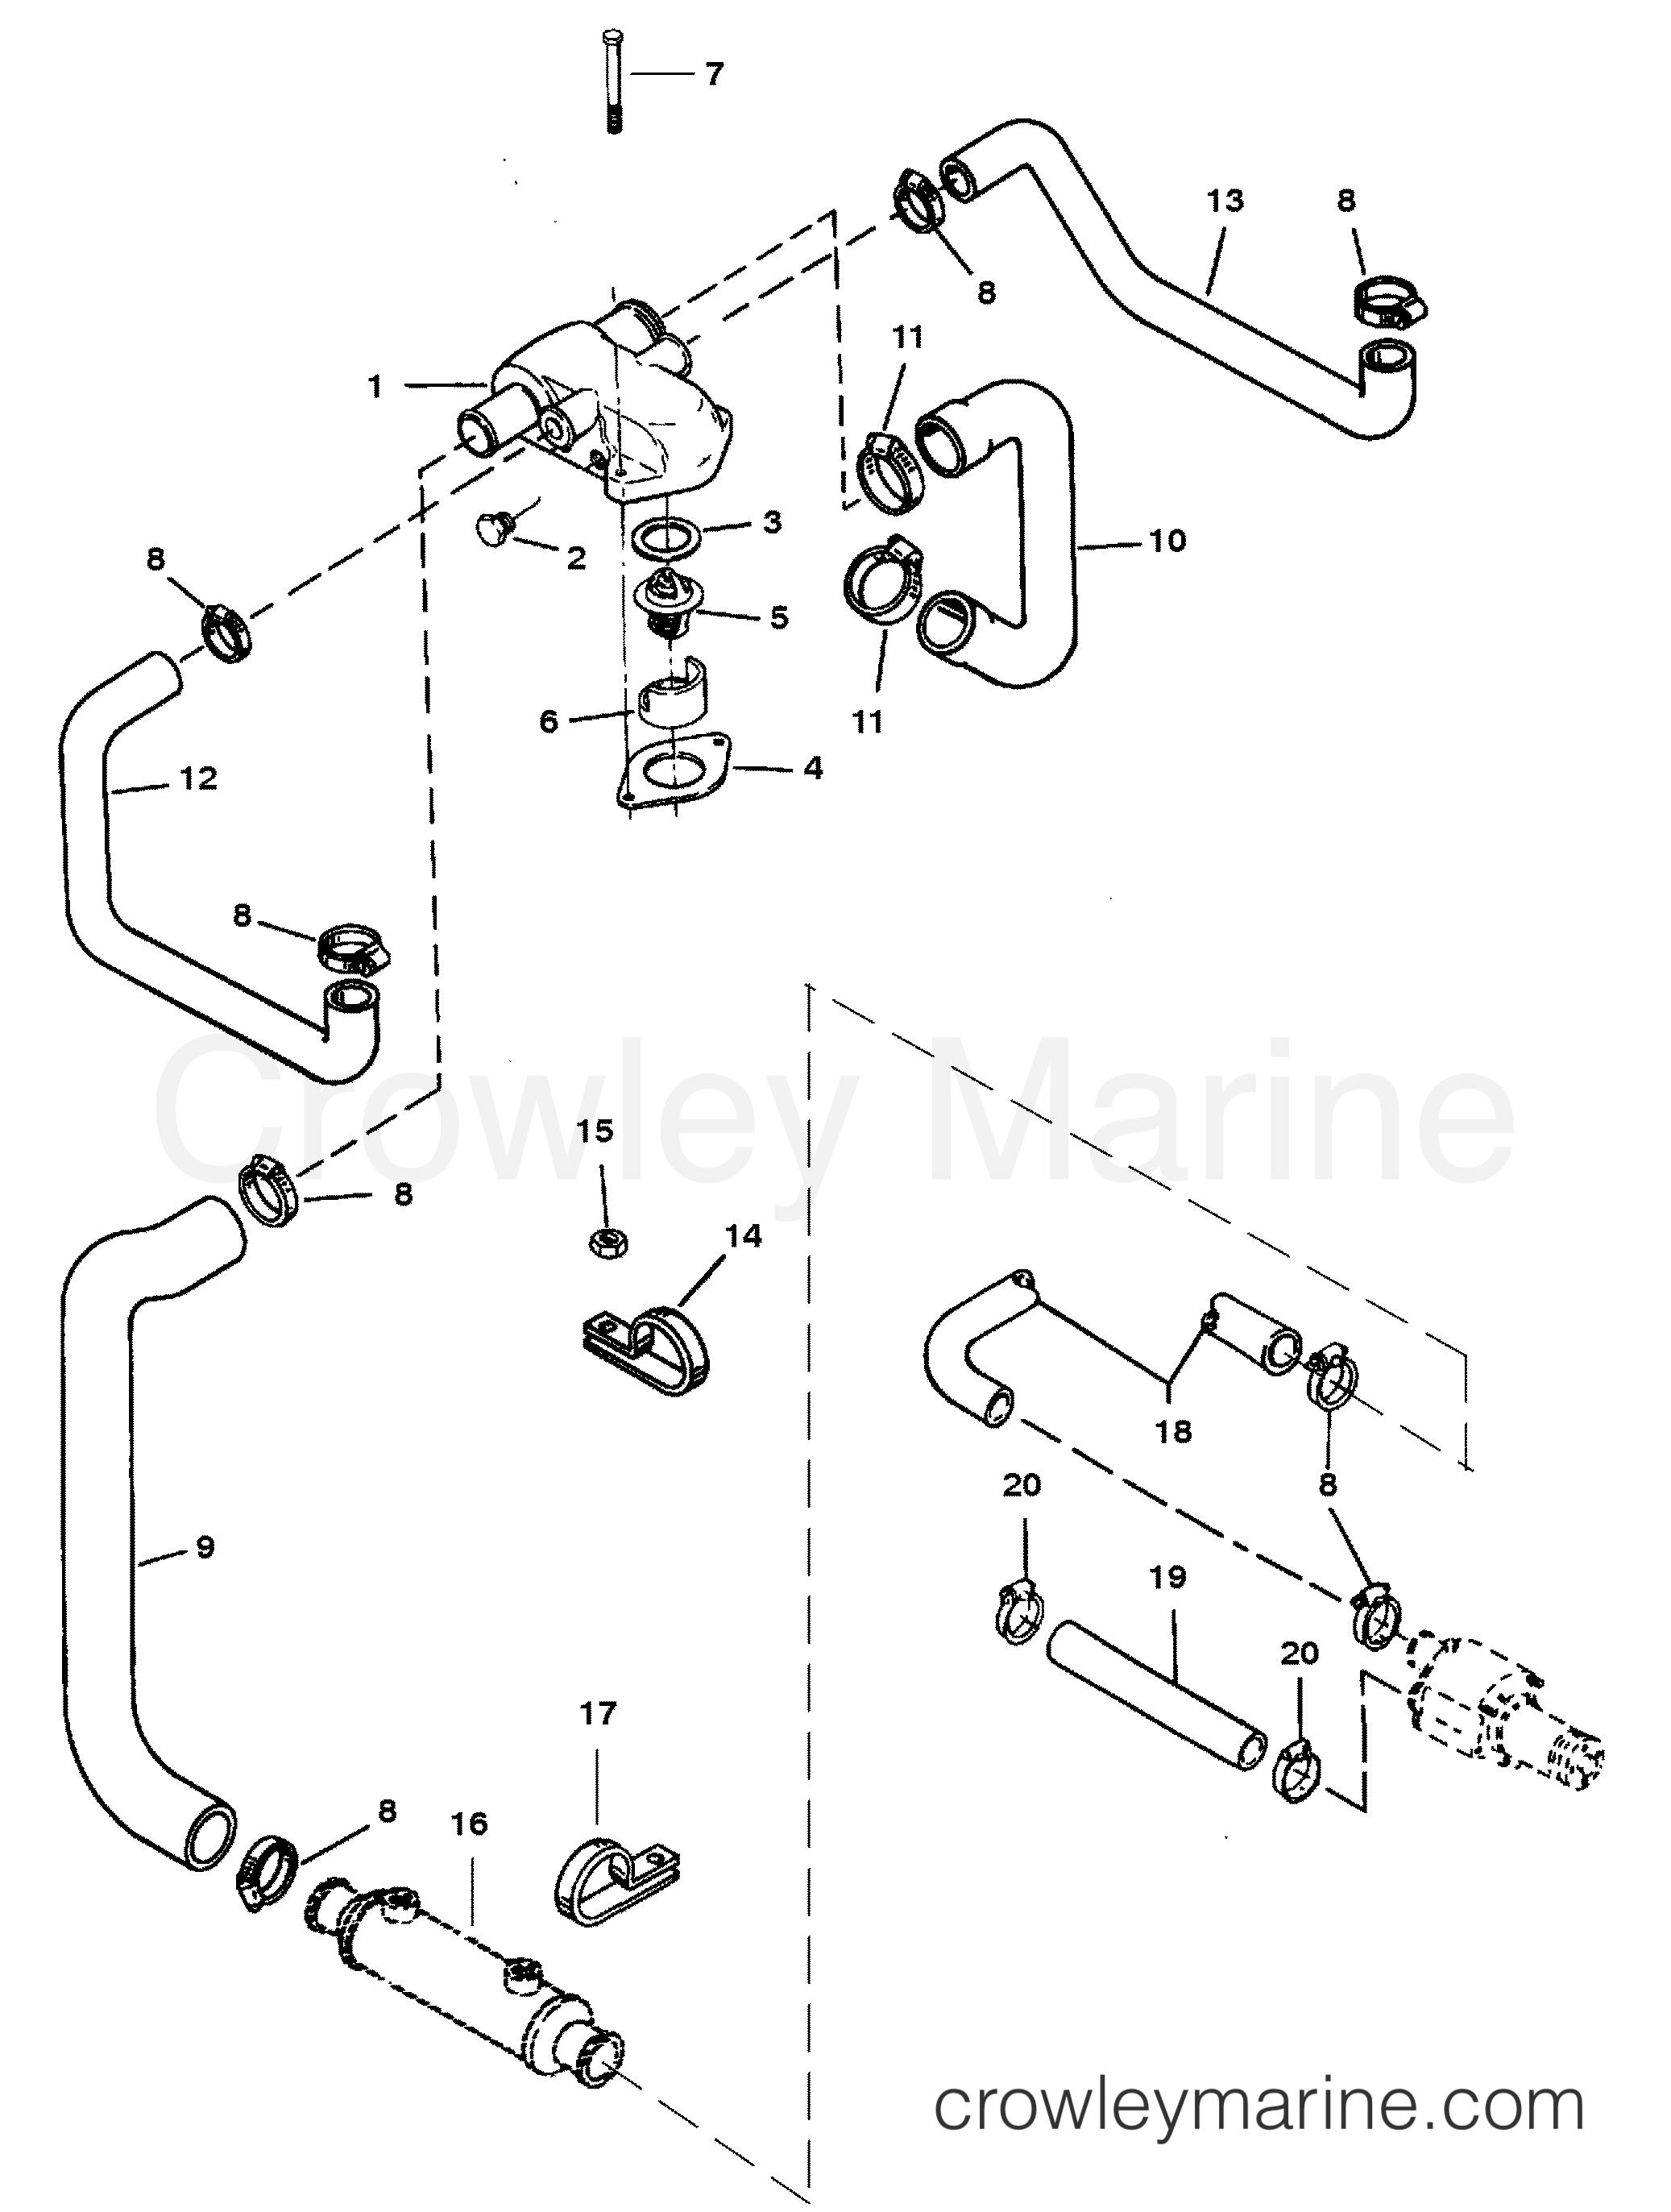 oppdnrAG standard cooling system (bravo engines) 1996 mercruiser 5 7l tbi